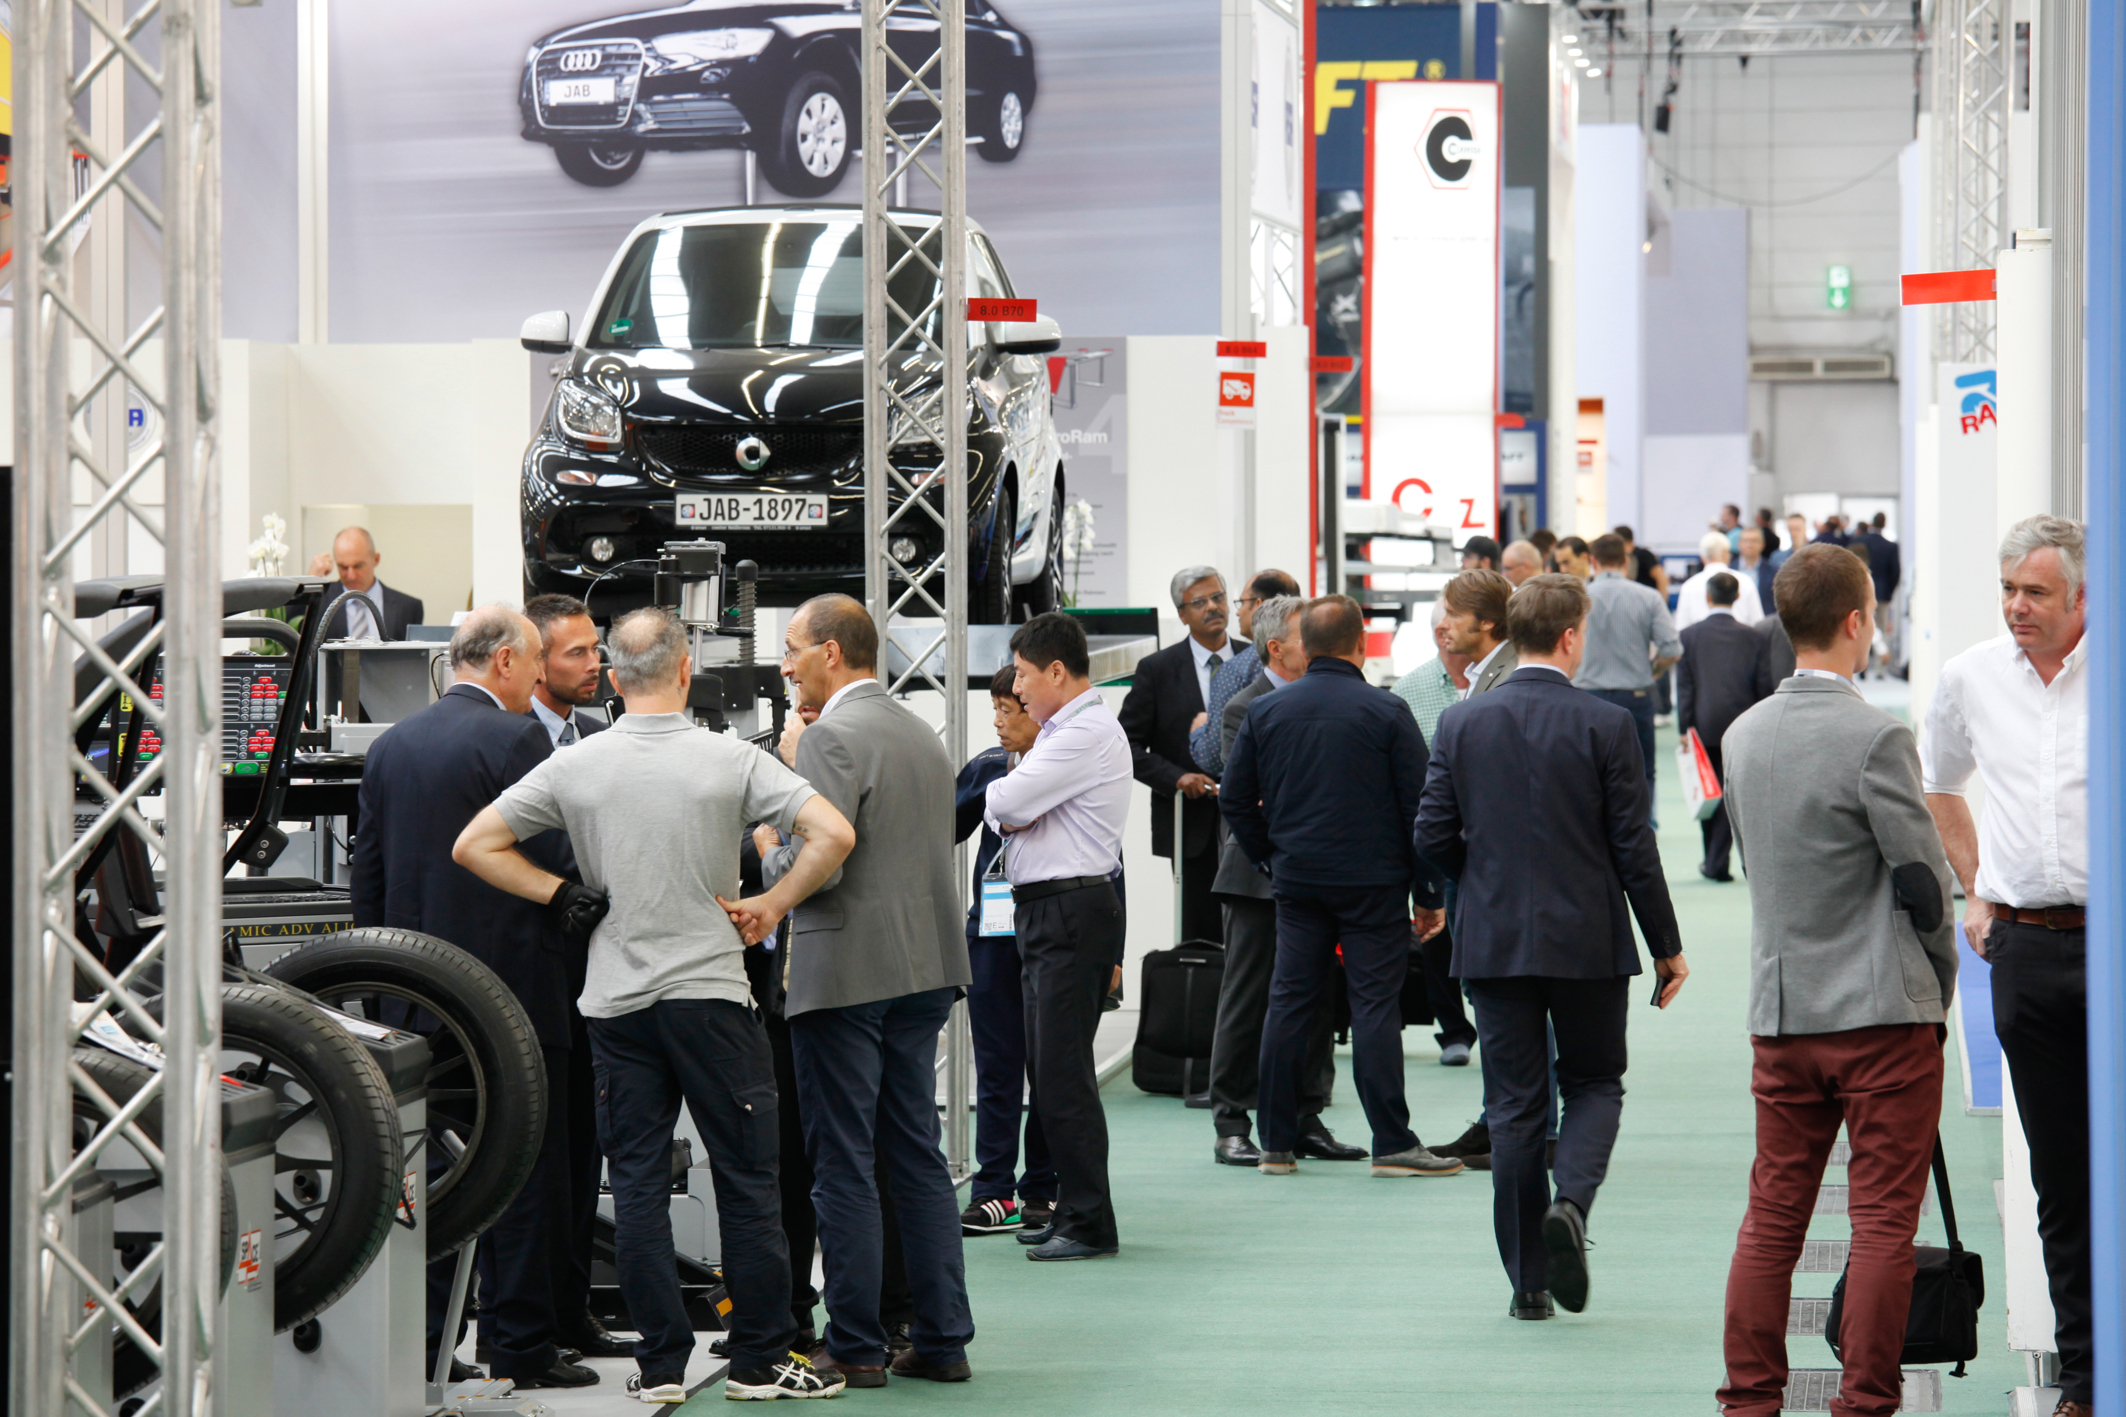 Automechanika - Information for exhibitors